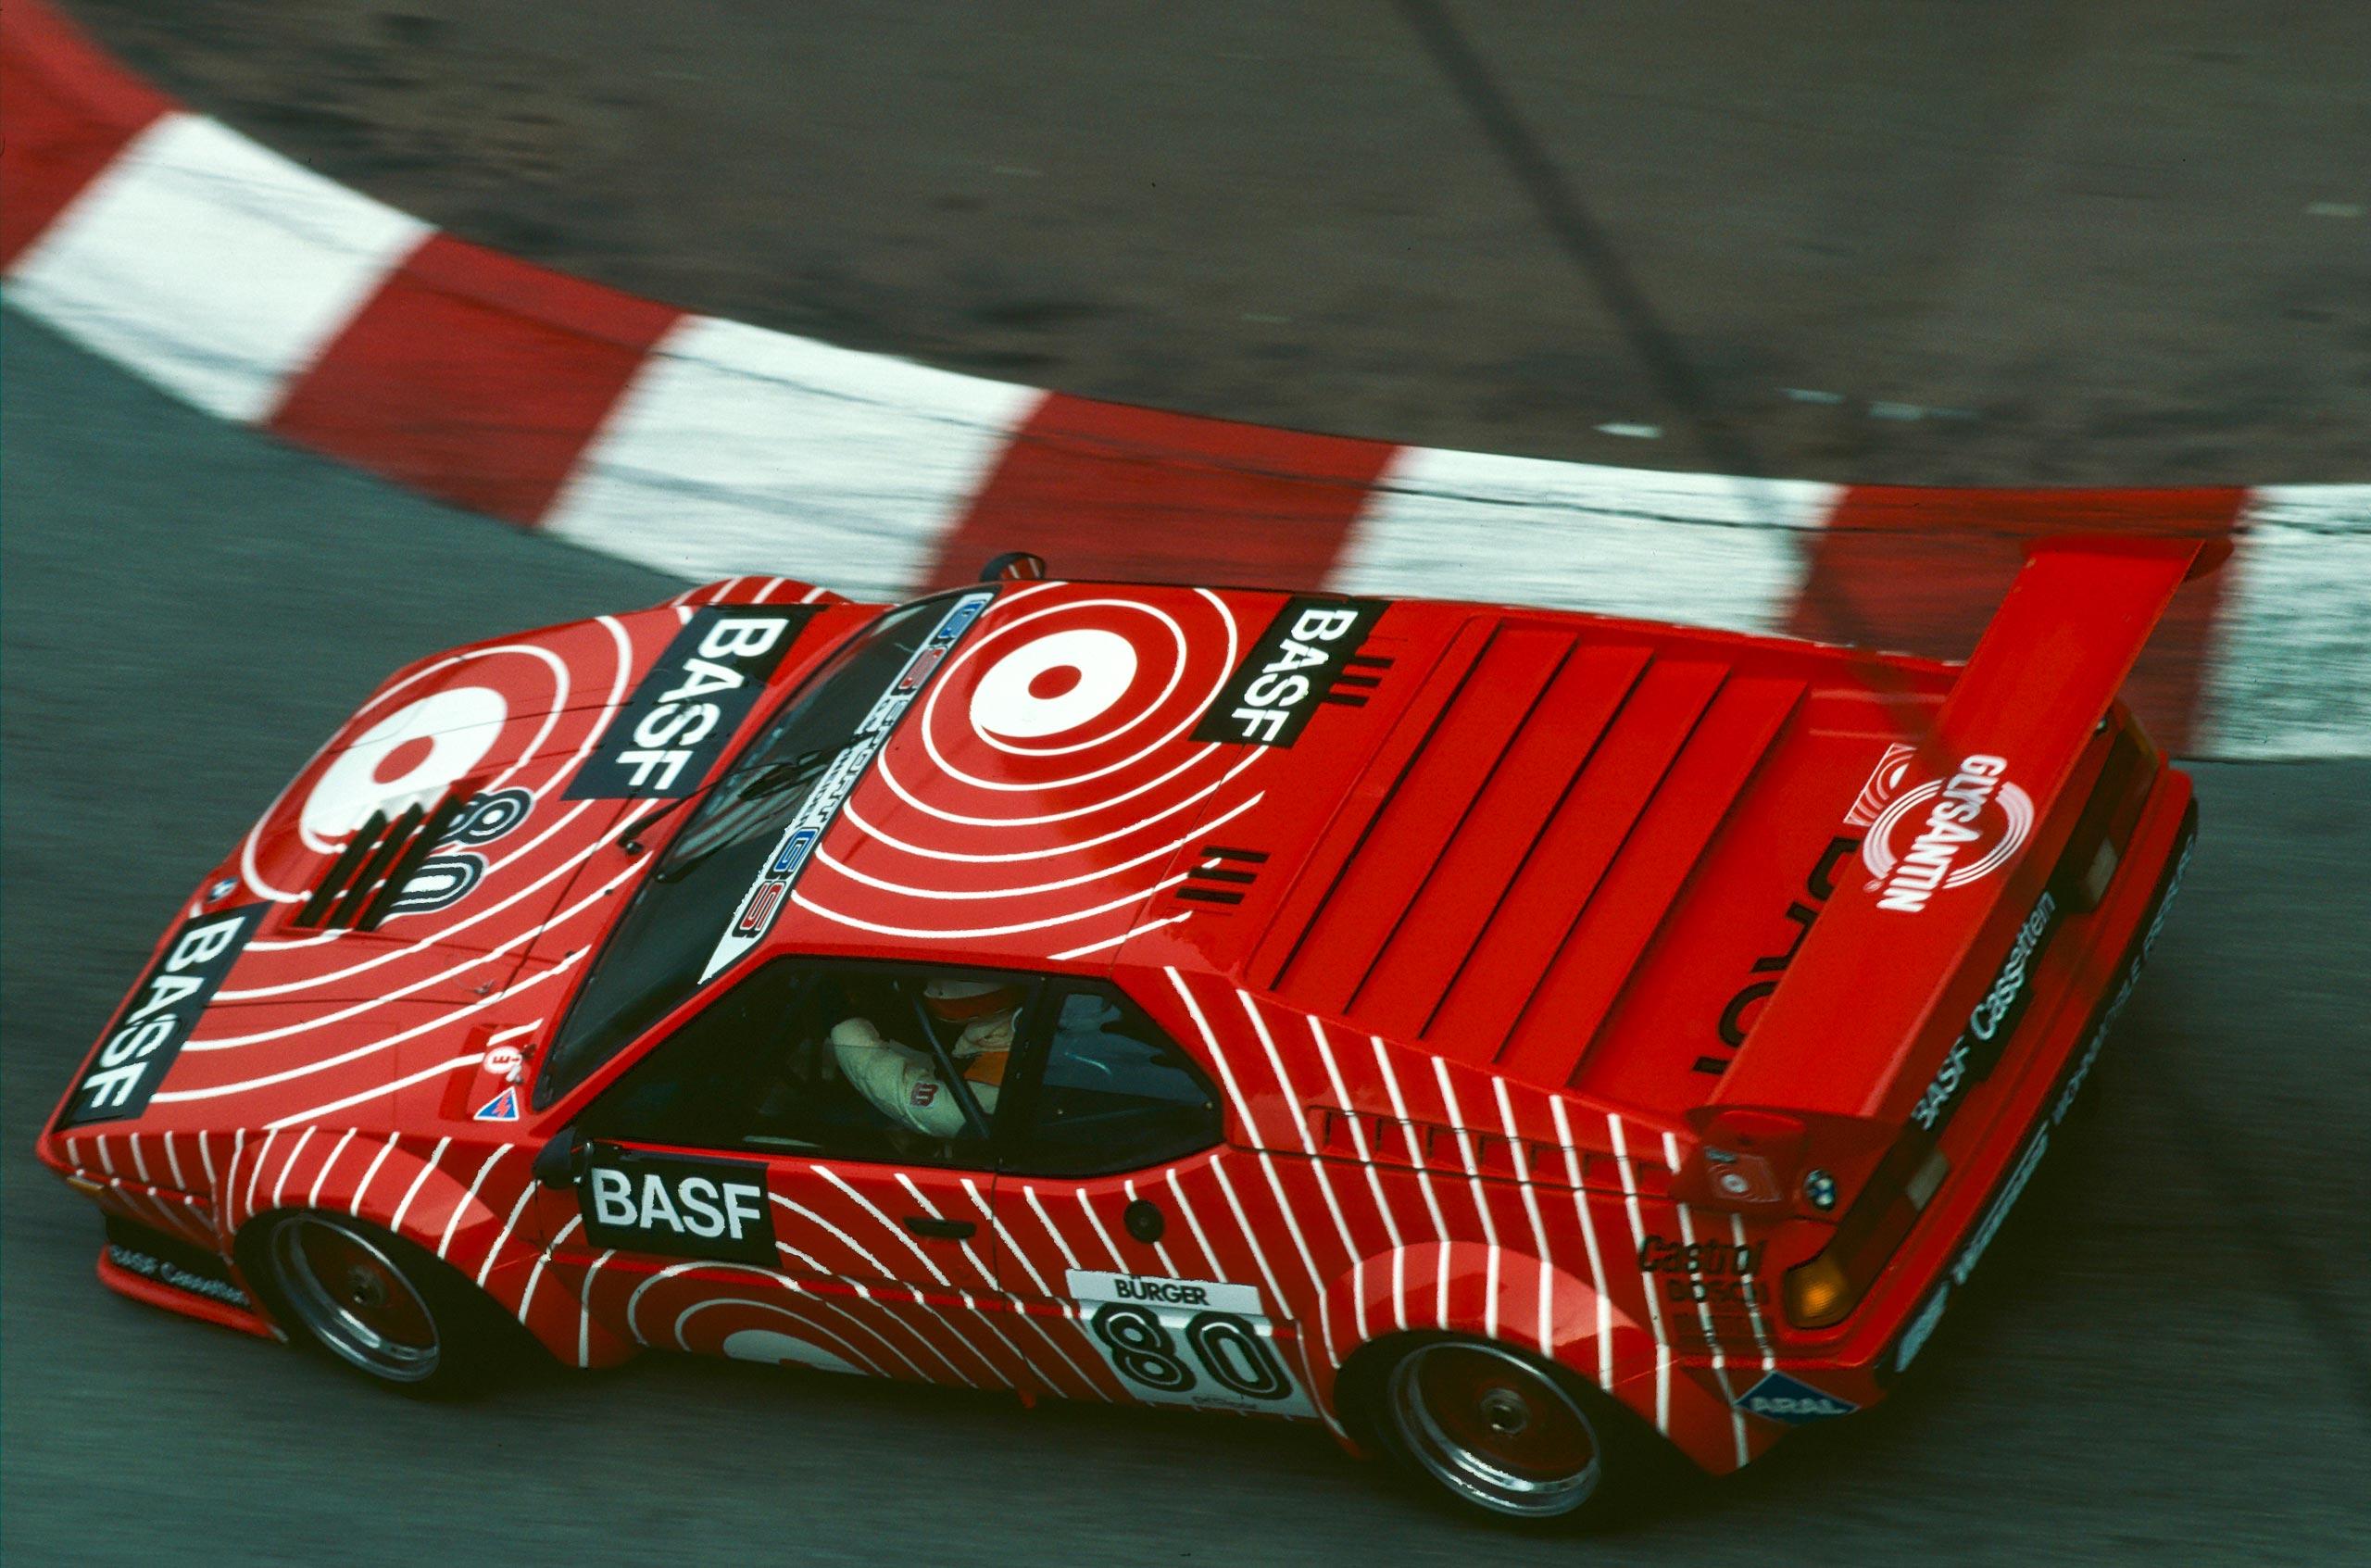 Nr. 80, Hans-Georg Bürger, Monaco, PROCAR-Serie 1980